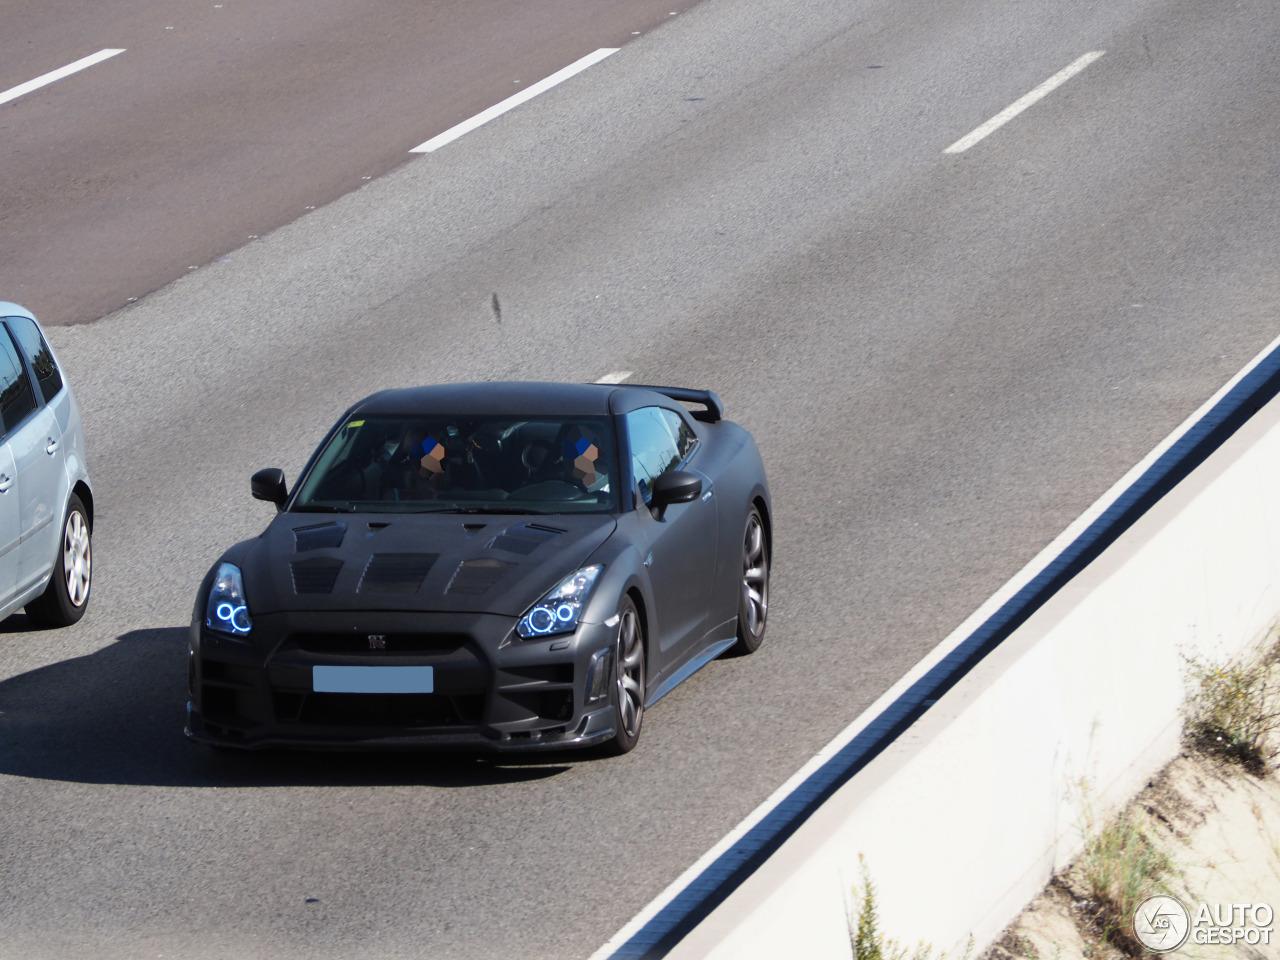 Nissan GT-R Litchfield LM600